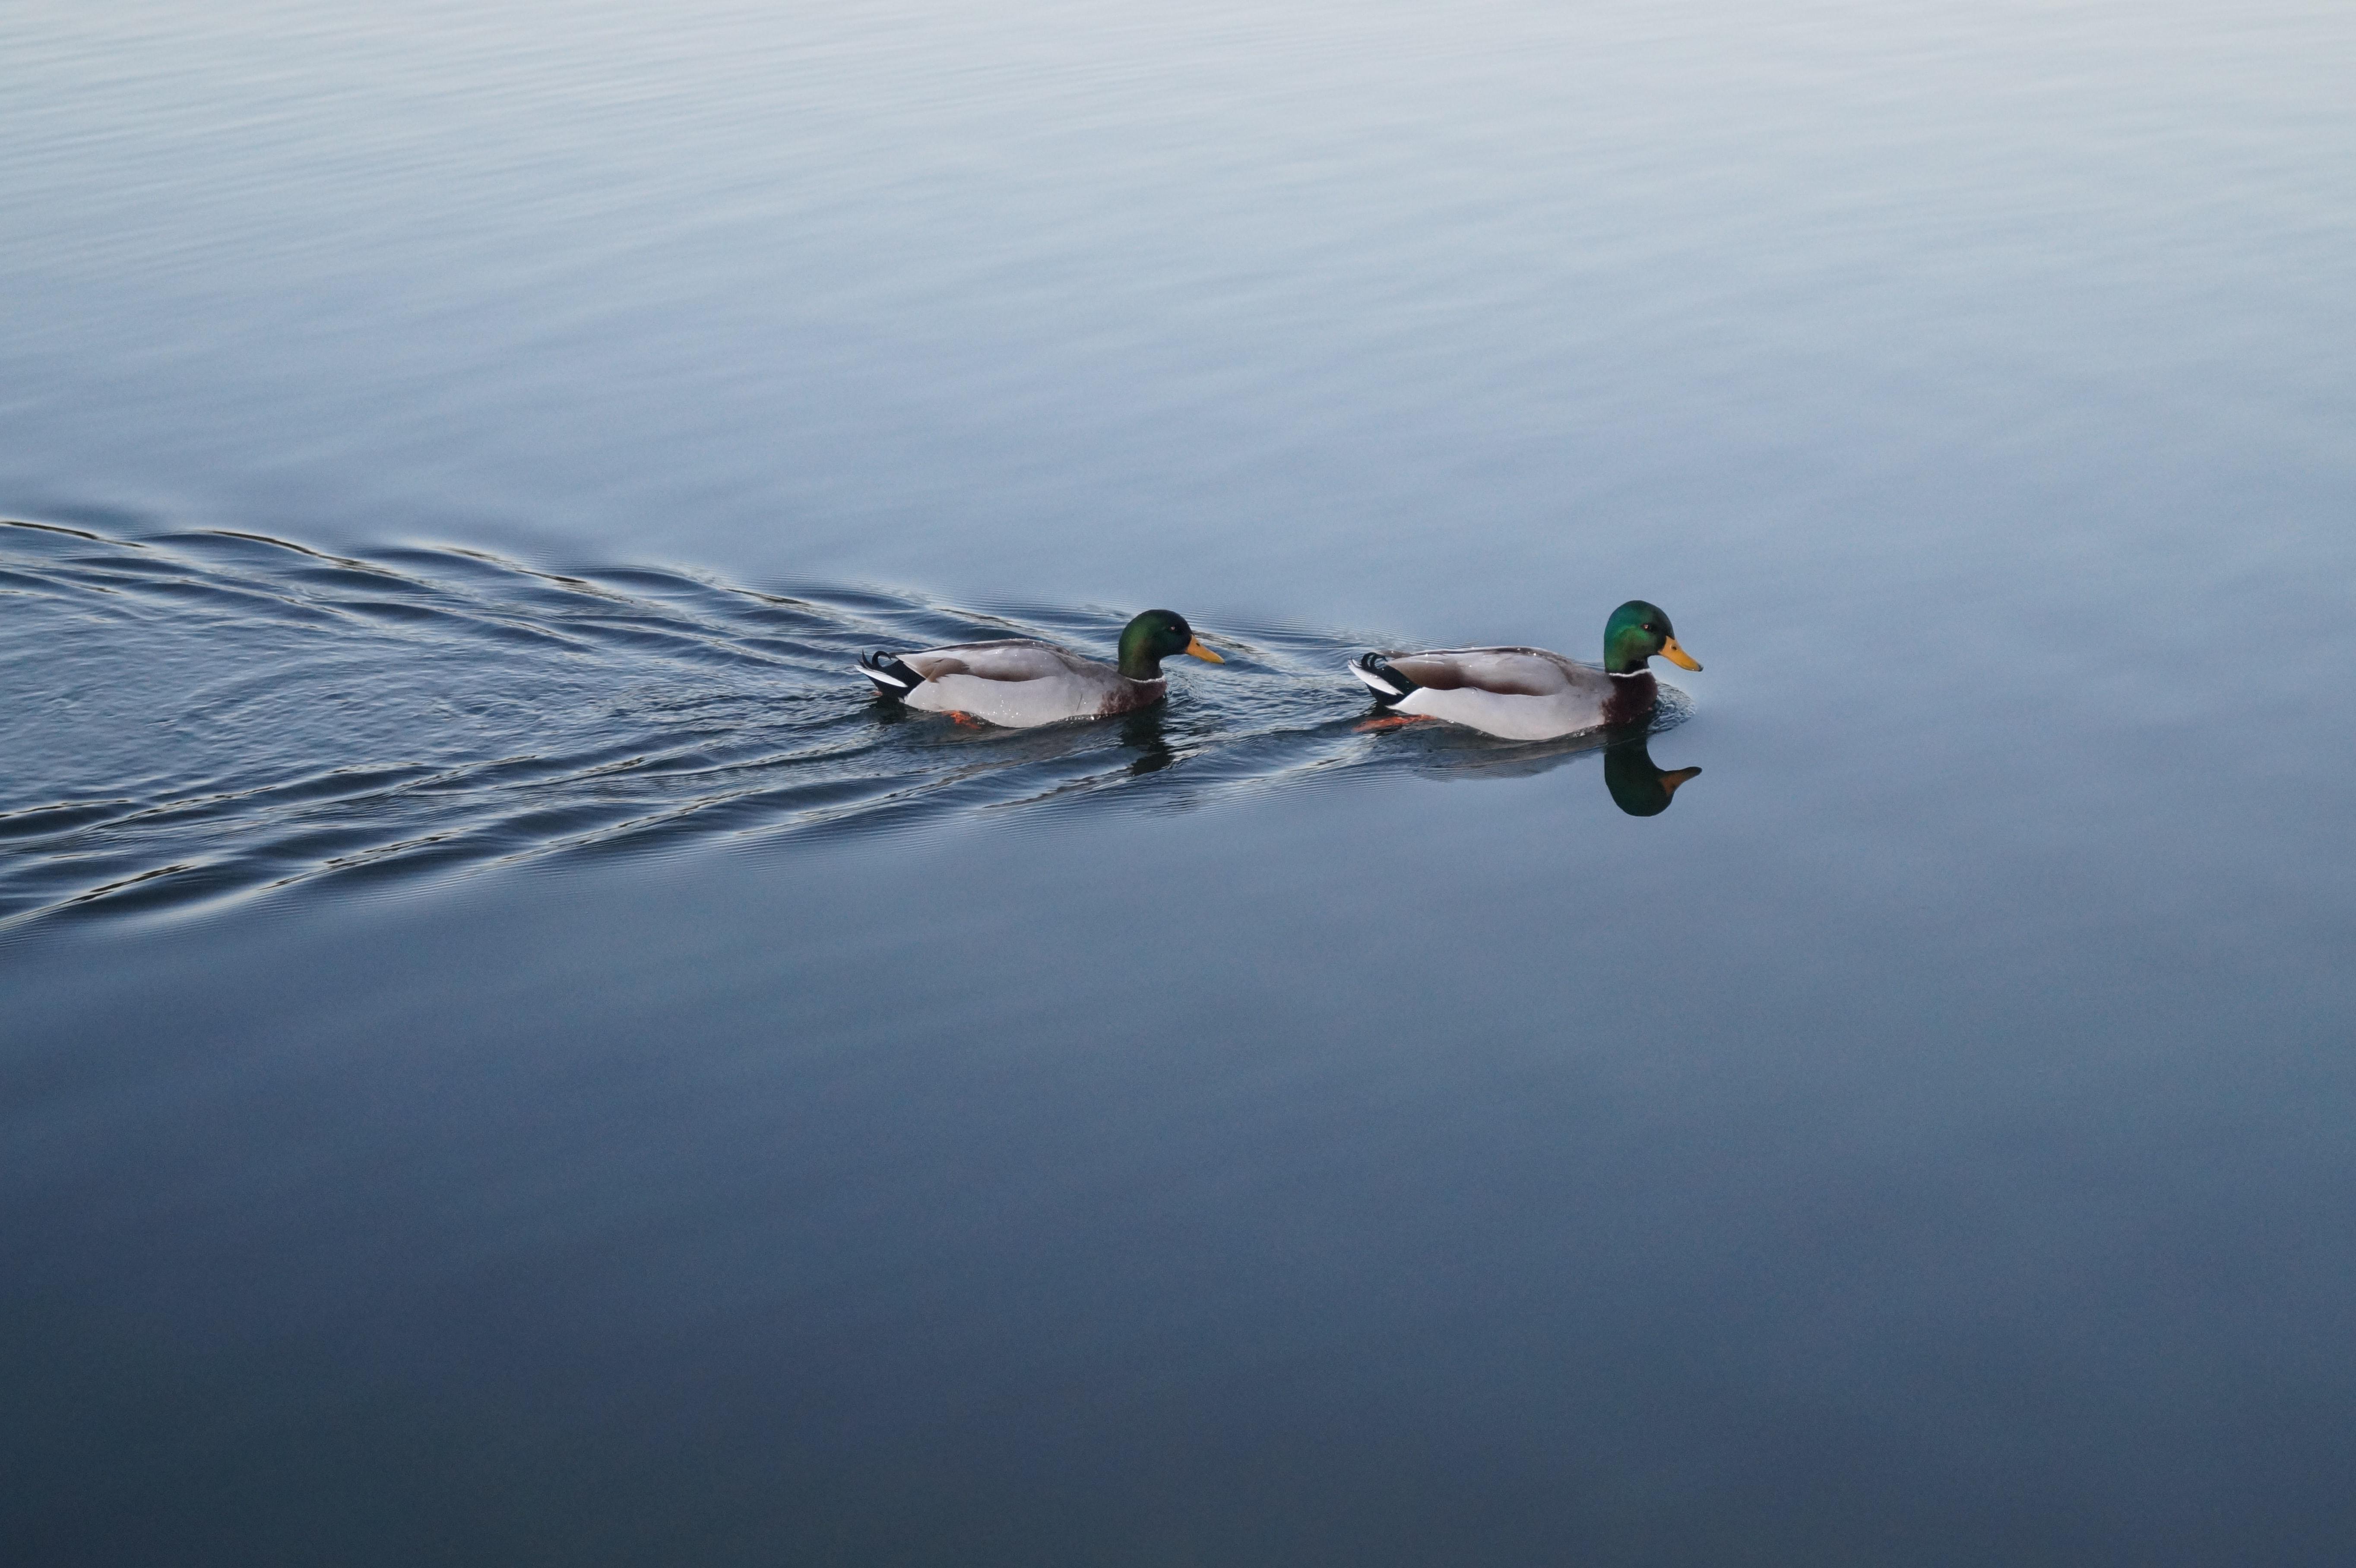 two male mallards swimming across calm water